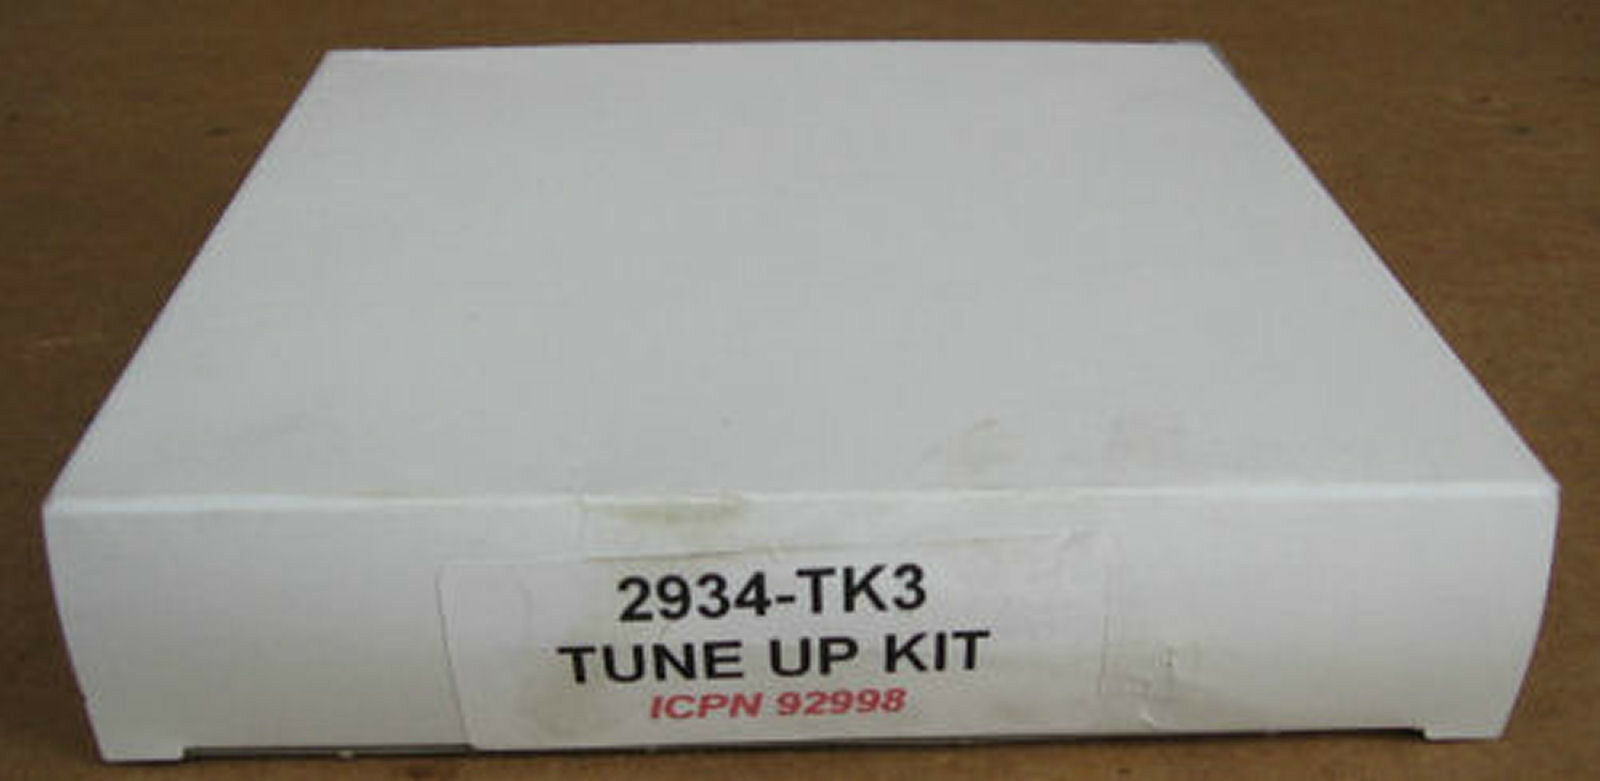 1  Impact Wrench Ingersoll Rand IR-2934 Tune Up Kit